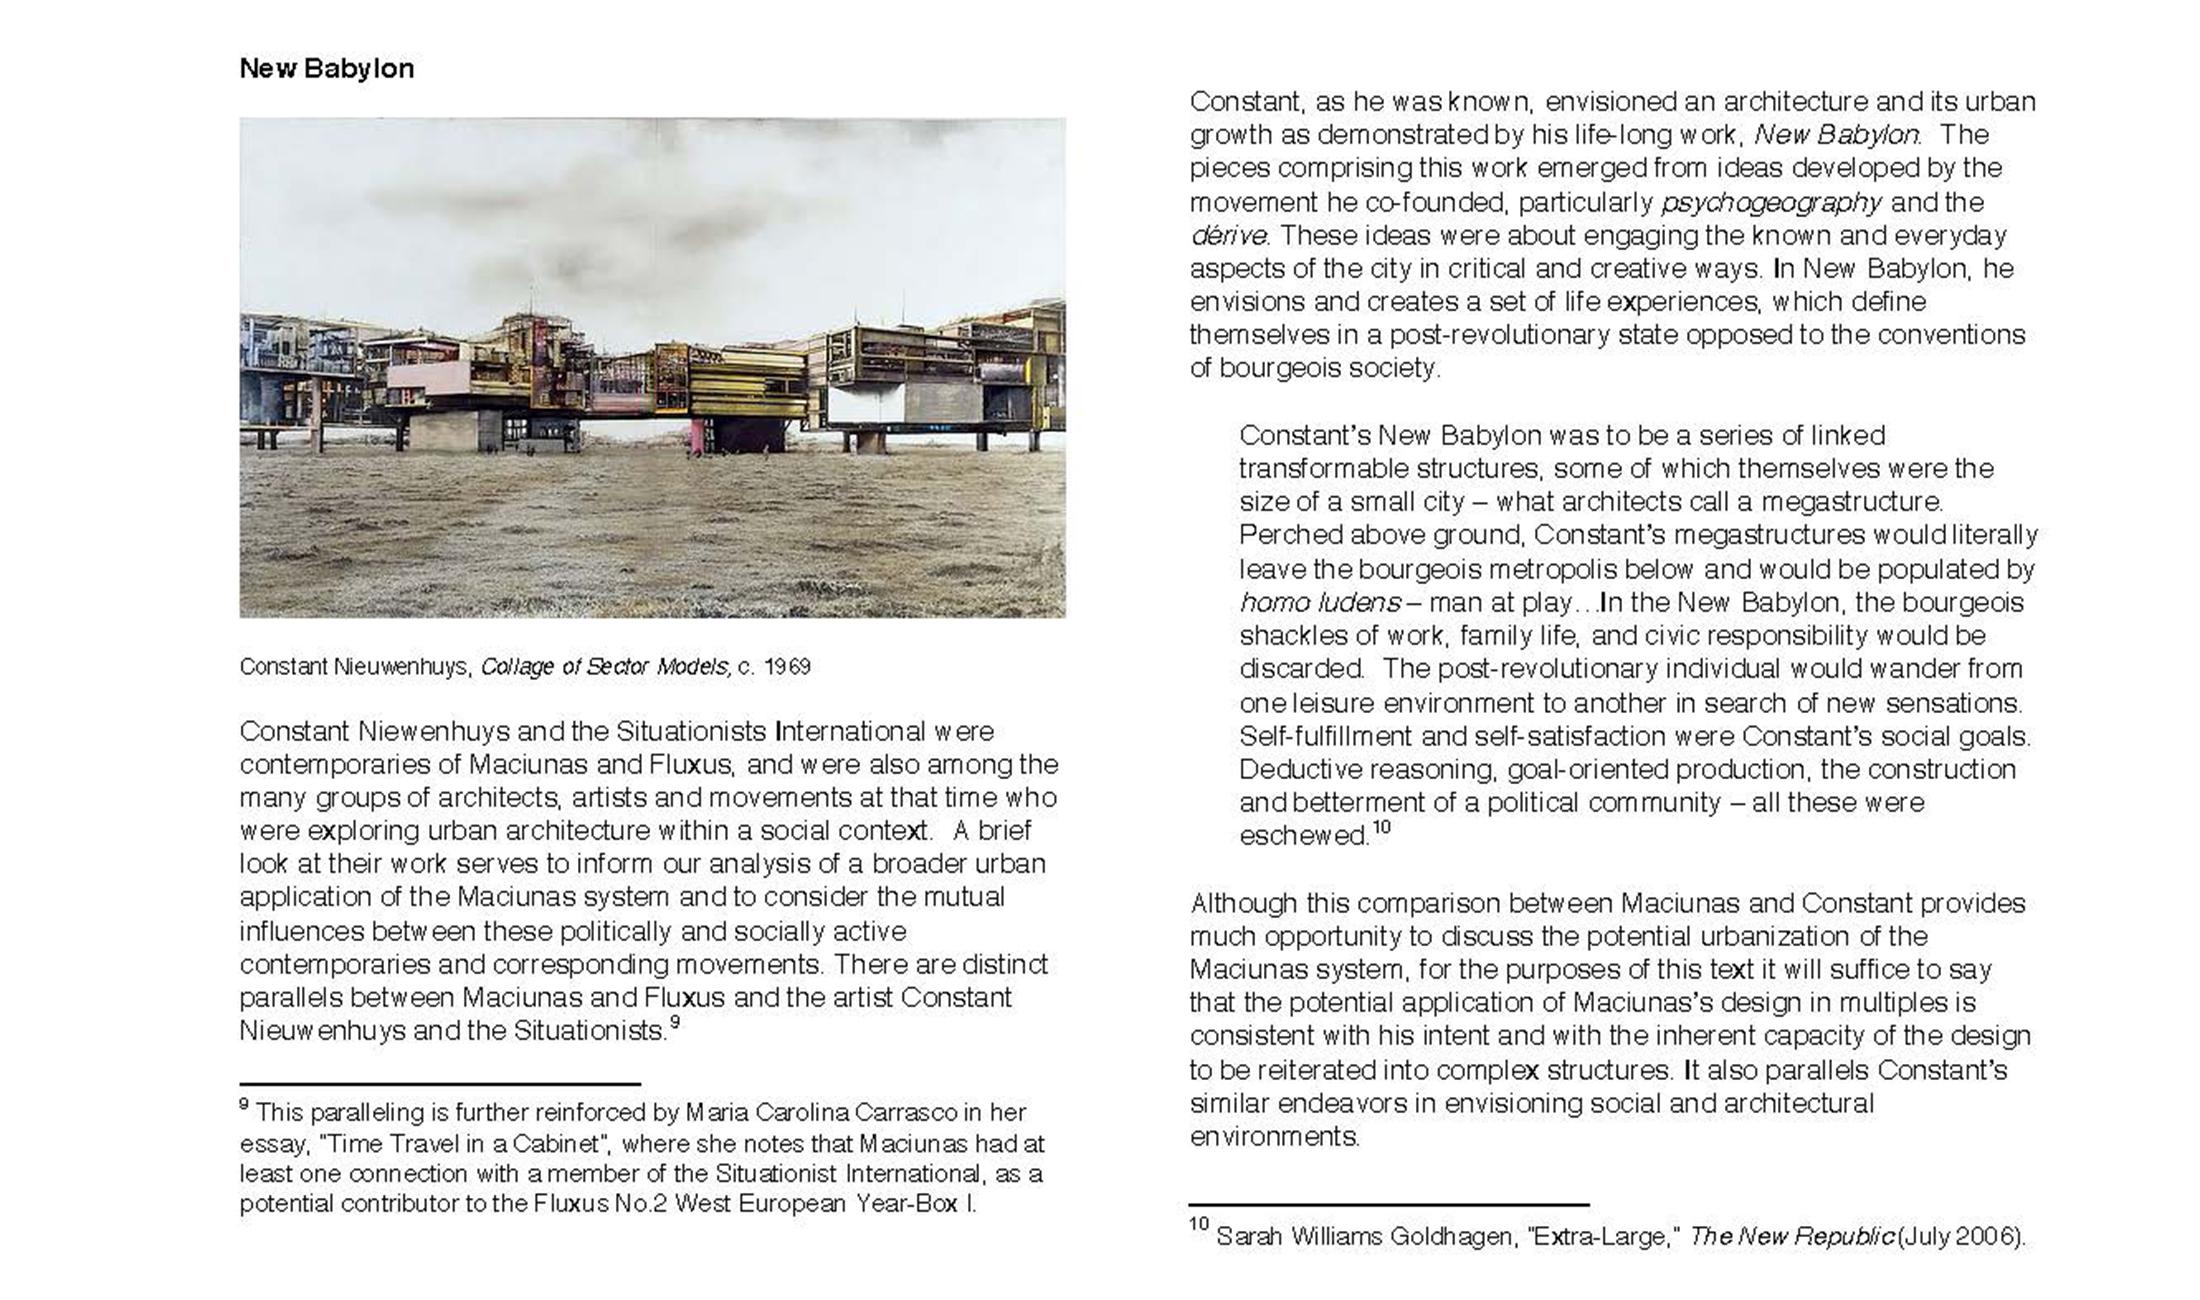 Maciunas Assessment Report 0509_Page_50.jpg